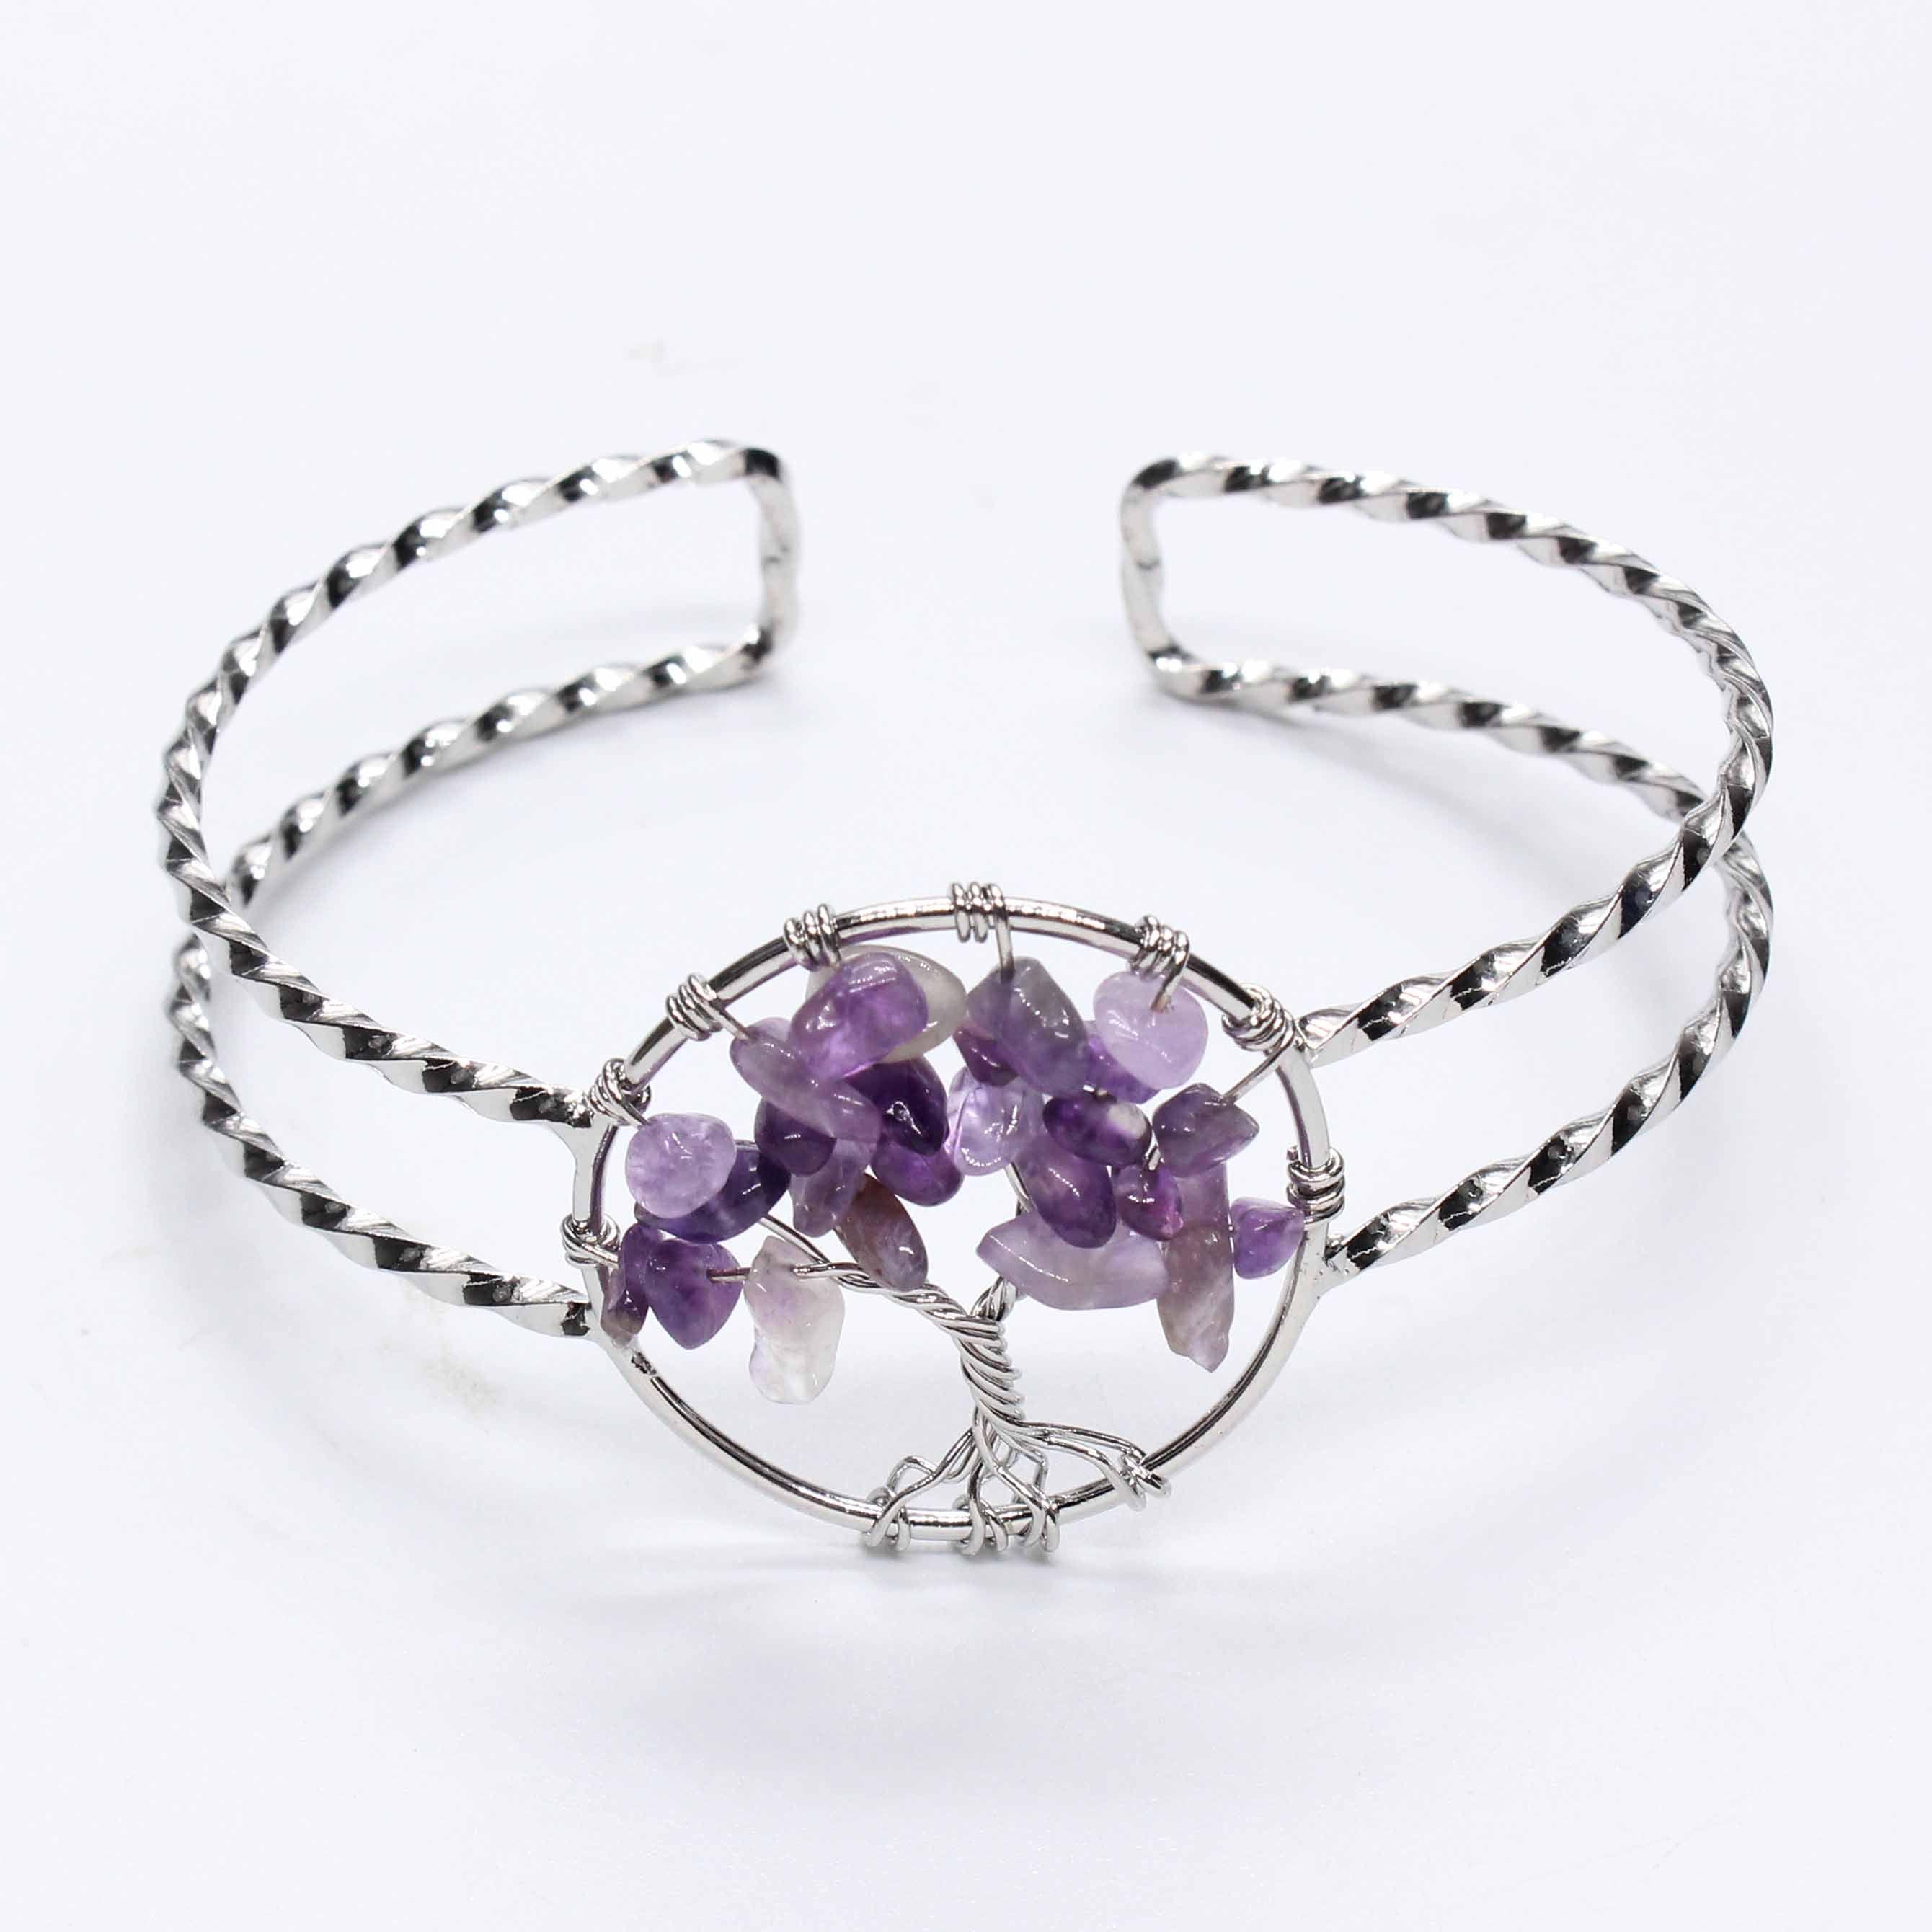 Wholesale 10 Pcs Silver Plated Olivine Green Aventurine Tree of Life Bangle For Female Rainbow Stone Jewelry